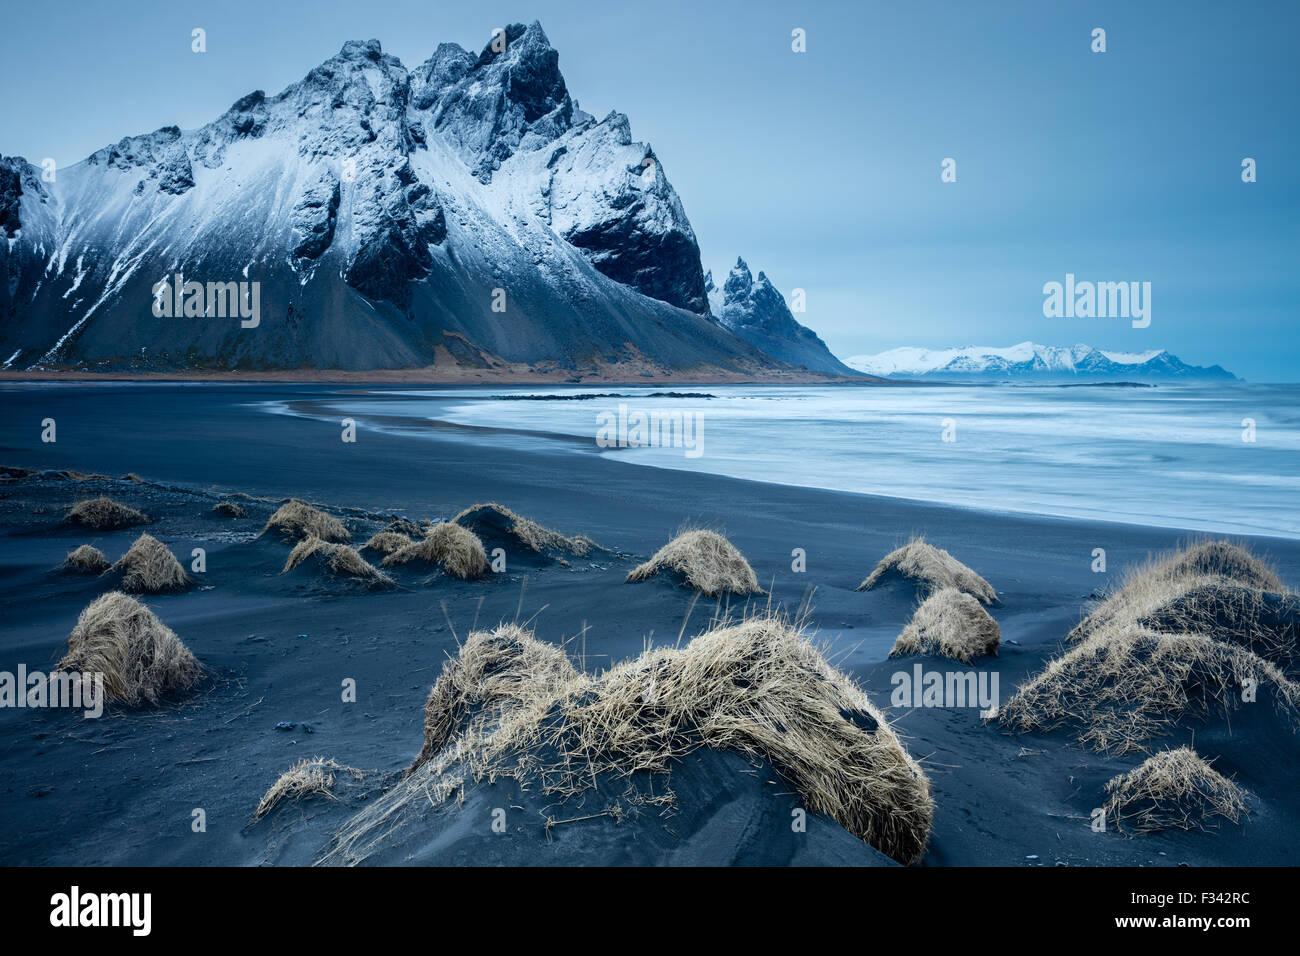 Dunas de arena en la península Stokksness, este de Islandia Imagen De Stock